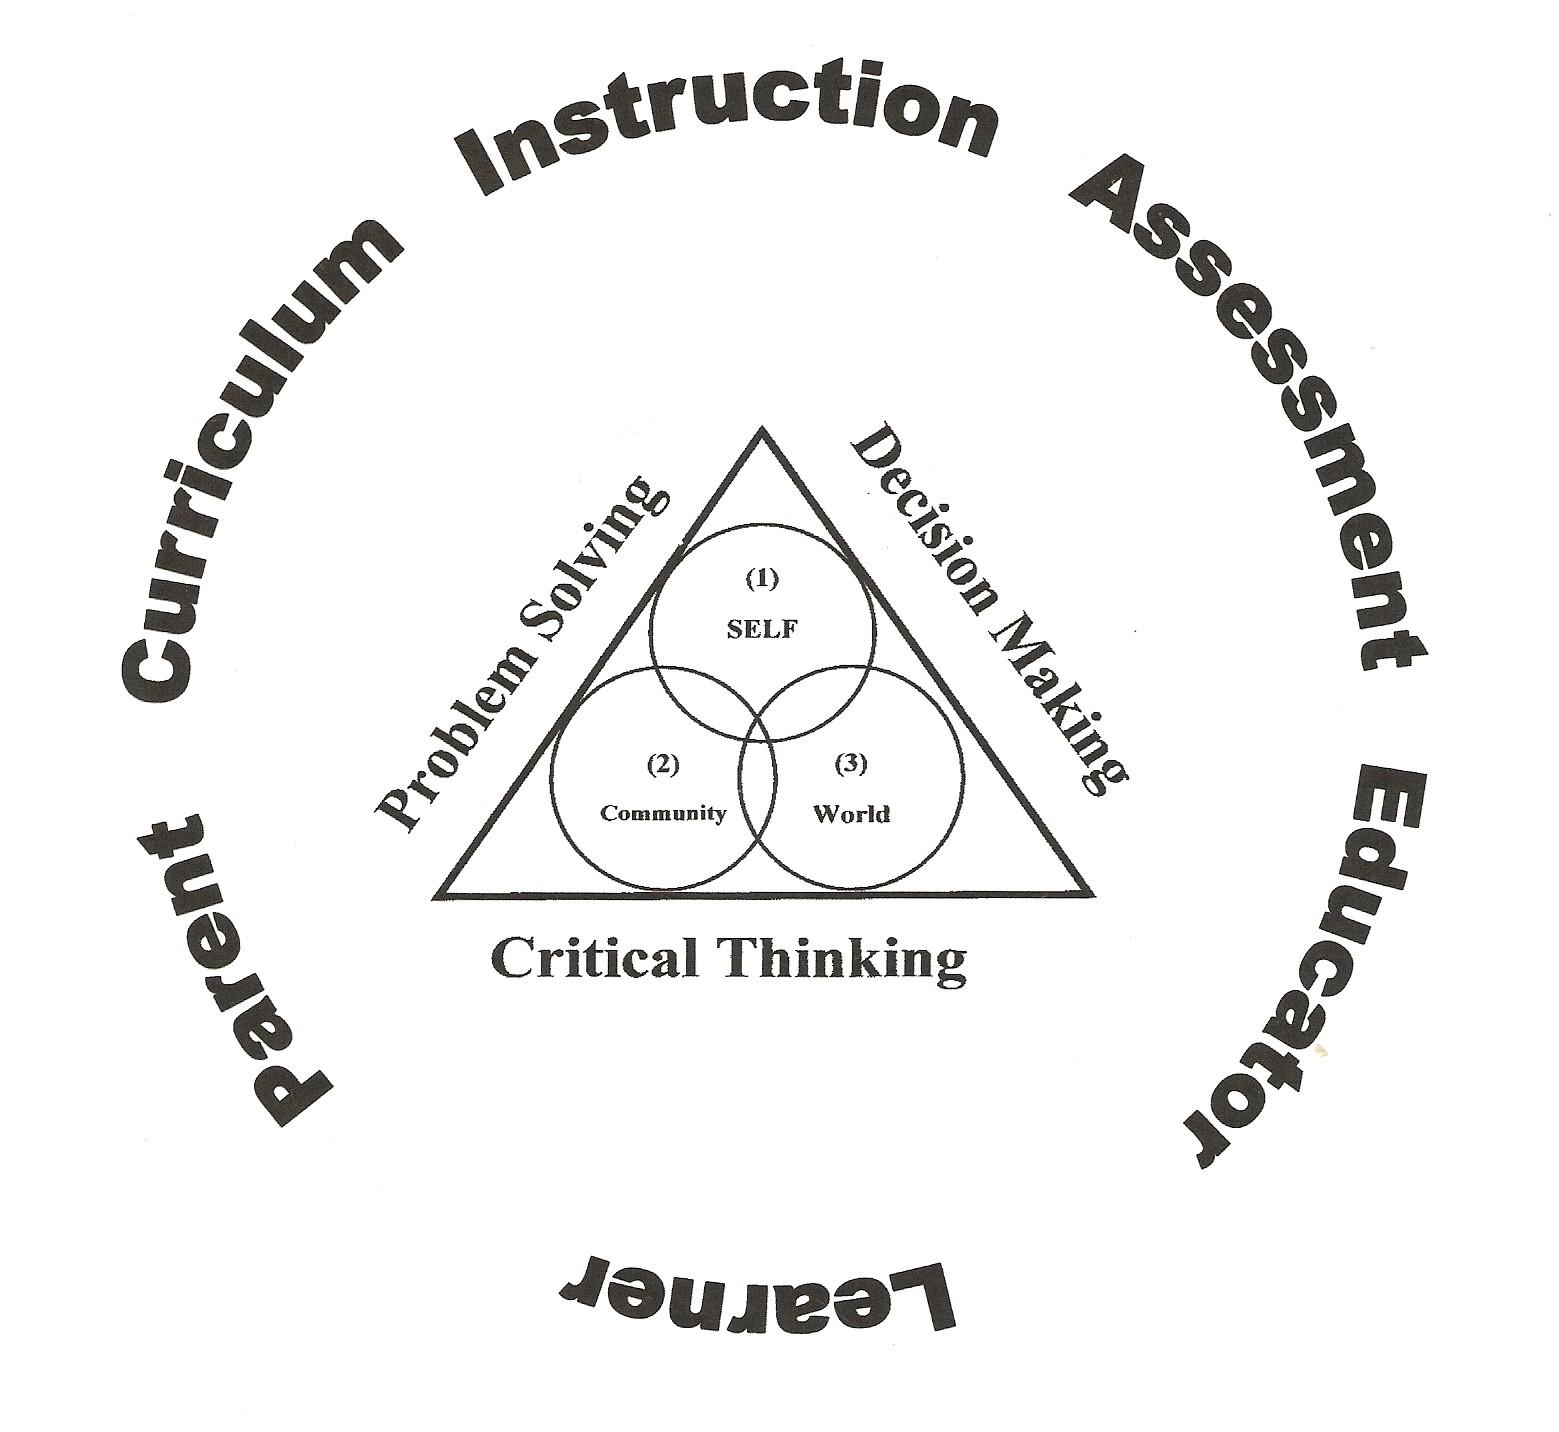 Wholistic Education: WEE, LLC Critical Thinking Initiative